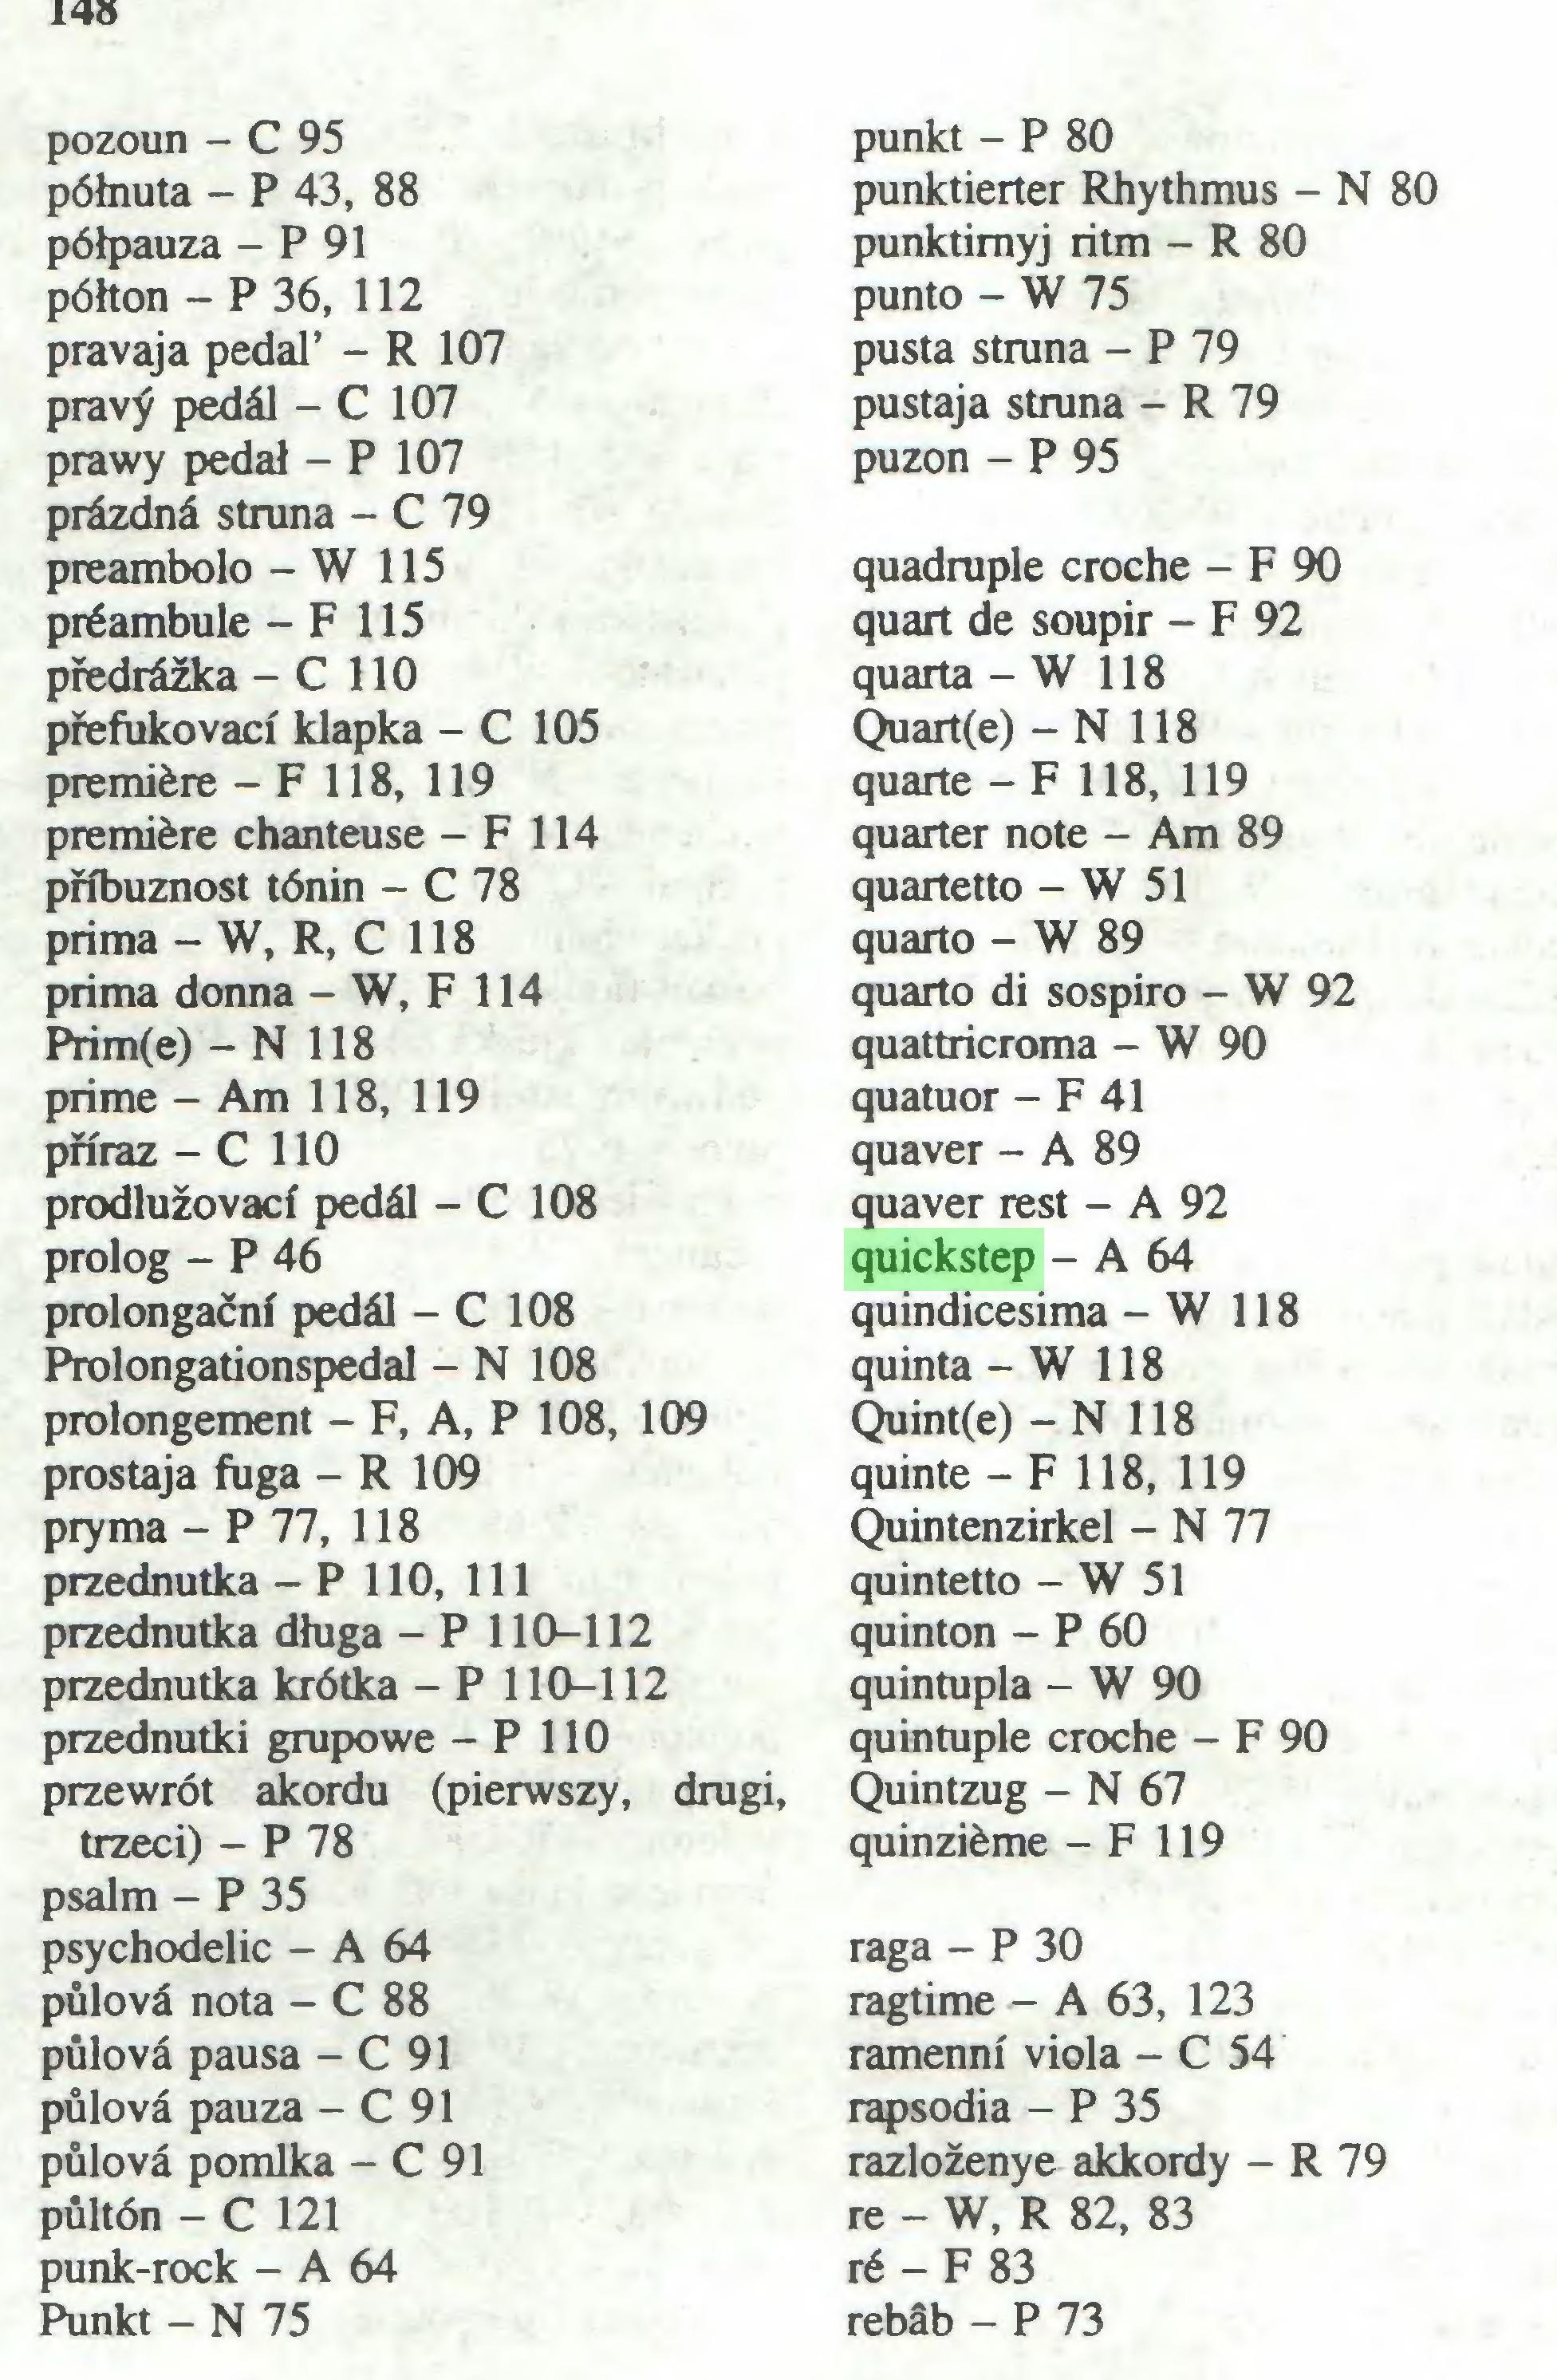 (...) pozorni - C 95 półnuta - P 43, 88 półpauza - P 91 półton - P 36, 112 pravaja pedał' - R 107 pravÿ pedał - C 107 prawy pedał - P 107 prâzdnâ struna - C 79 preambolo - W 115 préambule - F 115 pfedrózka - C 110 pfefukovaci klapka - C 105 première - F 118, 119 première chanteuse - F 114 pfibuznost tónin - C 78 prima - W, R, C 118 prima donna - W, F 114 Prim(e) - N 118 prime - Am 118, 119 piïraz - C 110 prodluzovaci pedâl - C 108 prolog - P 46 prolongacni pedâl - C 108 Prolongationspedal - N 108 prolongement - F, A, P 108, 109 prostaja fuga - R 109 pryma - P 77, 118 przednutka - P 110, 111 przednutka długa - P 110-112 przednutka krótka - P 110-112 przednutki grupowe - P 110 przewrót akordu (pierwszy, drugi, trzeci) - P 78 psalm - P 35 psychodel ic - A 64 pûlovâ nota - C 88 pûlovâ pausa - C 91 pûlovâ pauza - C 91 pûlovâ pomlka - C 91 pûltôn - C 121 punk-rock - A 64 Punkt - N 75 punkt - P 80 punktierter Rhythmus - N 80 punktimyj ritm - R 80 punto - W 75 pusta struna - P 79 pustaja stmna - R 79 puzon - P 95 quadruple croche - F 90 quart de soupir - F 92 quarta - W 118 Quart(e) - N 118 quarte - F 118, 119 quarter note - Am 89 quartetto - W 51 quarto - W 89 quarto di sospiro - W 92 quattricroma - W 90 quatuor - F 41 quaver - A 89 quaver rest - A 92 quickstep - A 64 quindicesima - W 118 quinta - W 118 Quint(e) - N 118 quinte - F 118, 119 Quintenzirkel - N 77 quintetto - W 51 quinton - P 60 quintupla - W 90 quintuple croche - F 90 Quintzug - N 67 quinzième - F 119 raga - P 30 ragtime - A 63, 123 ramenni viola - C 54 rapsodia - P 35 razlozenye akkordy - R 79 re - W, R 82, 83 ré - F 83 rebâb - P 73 149...